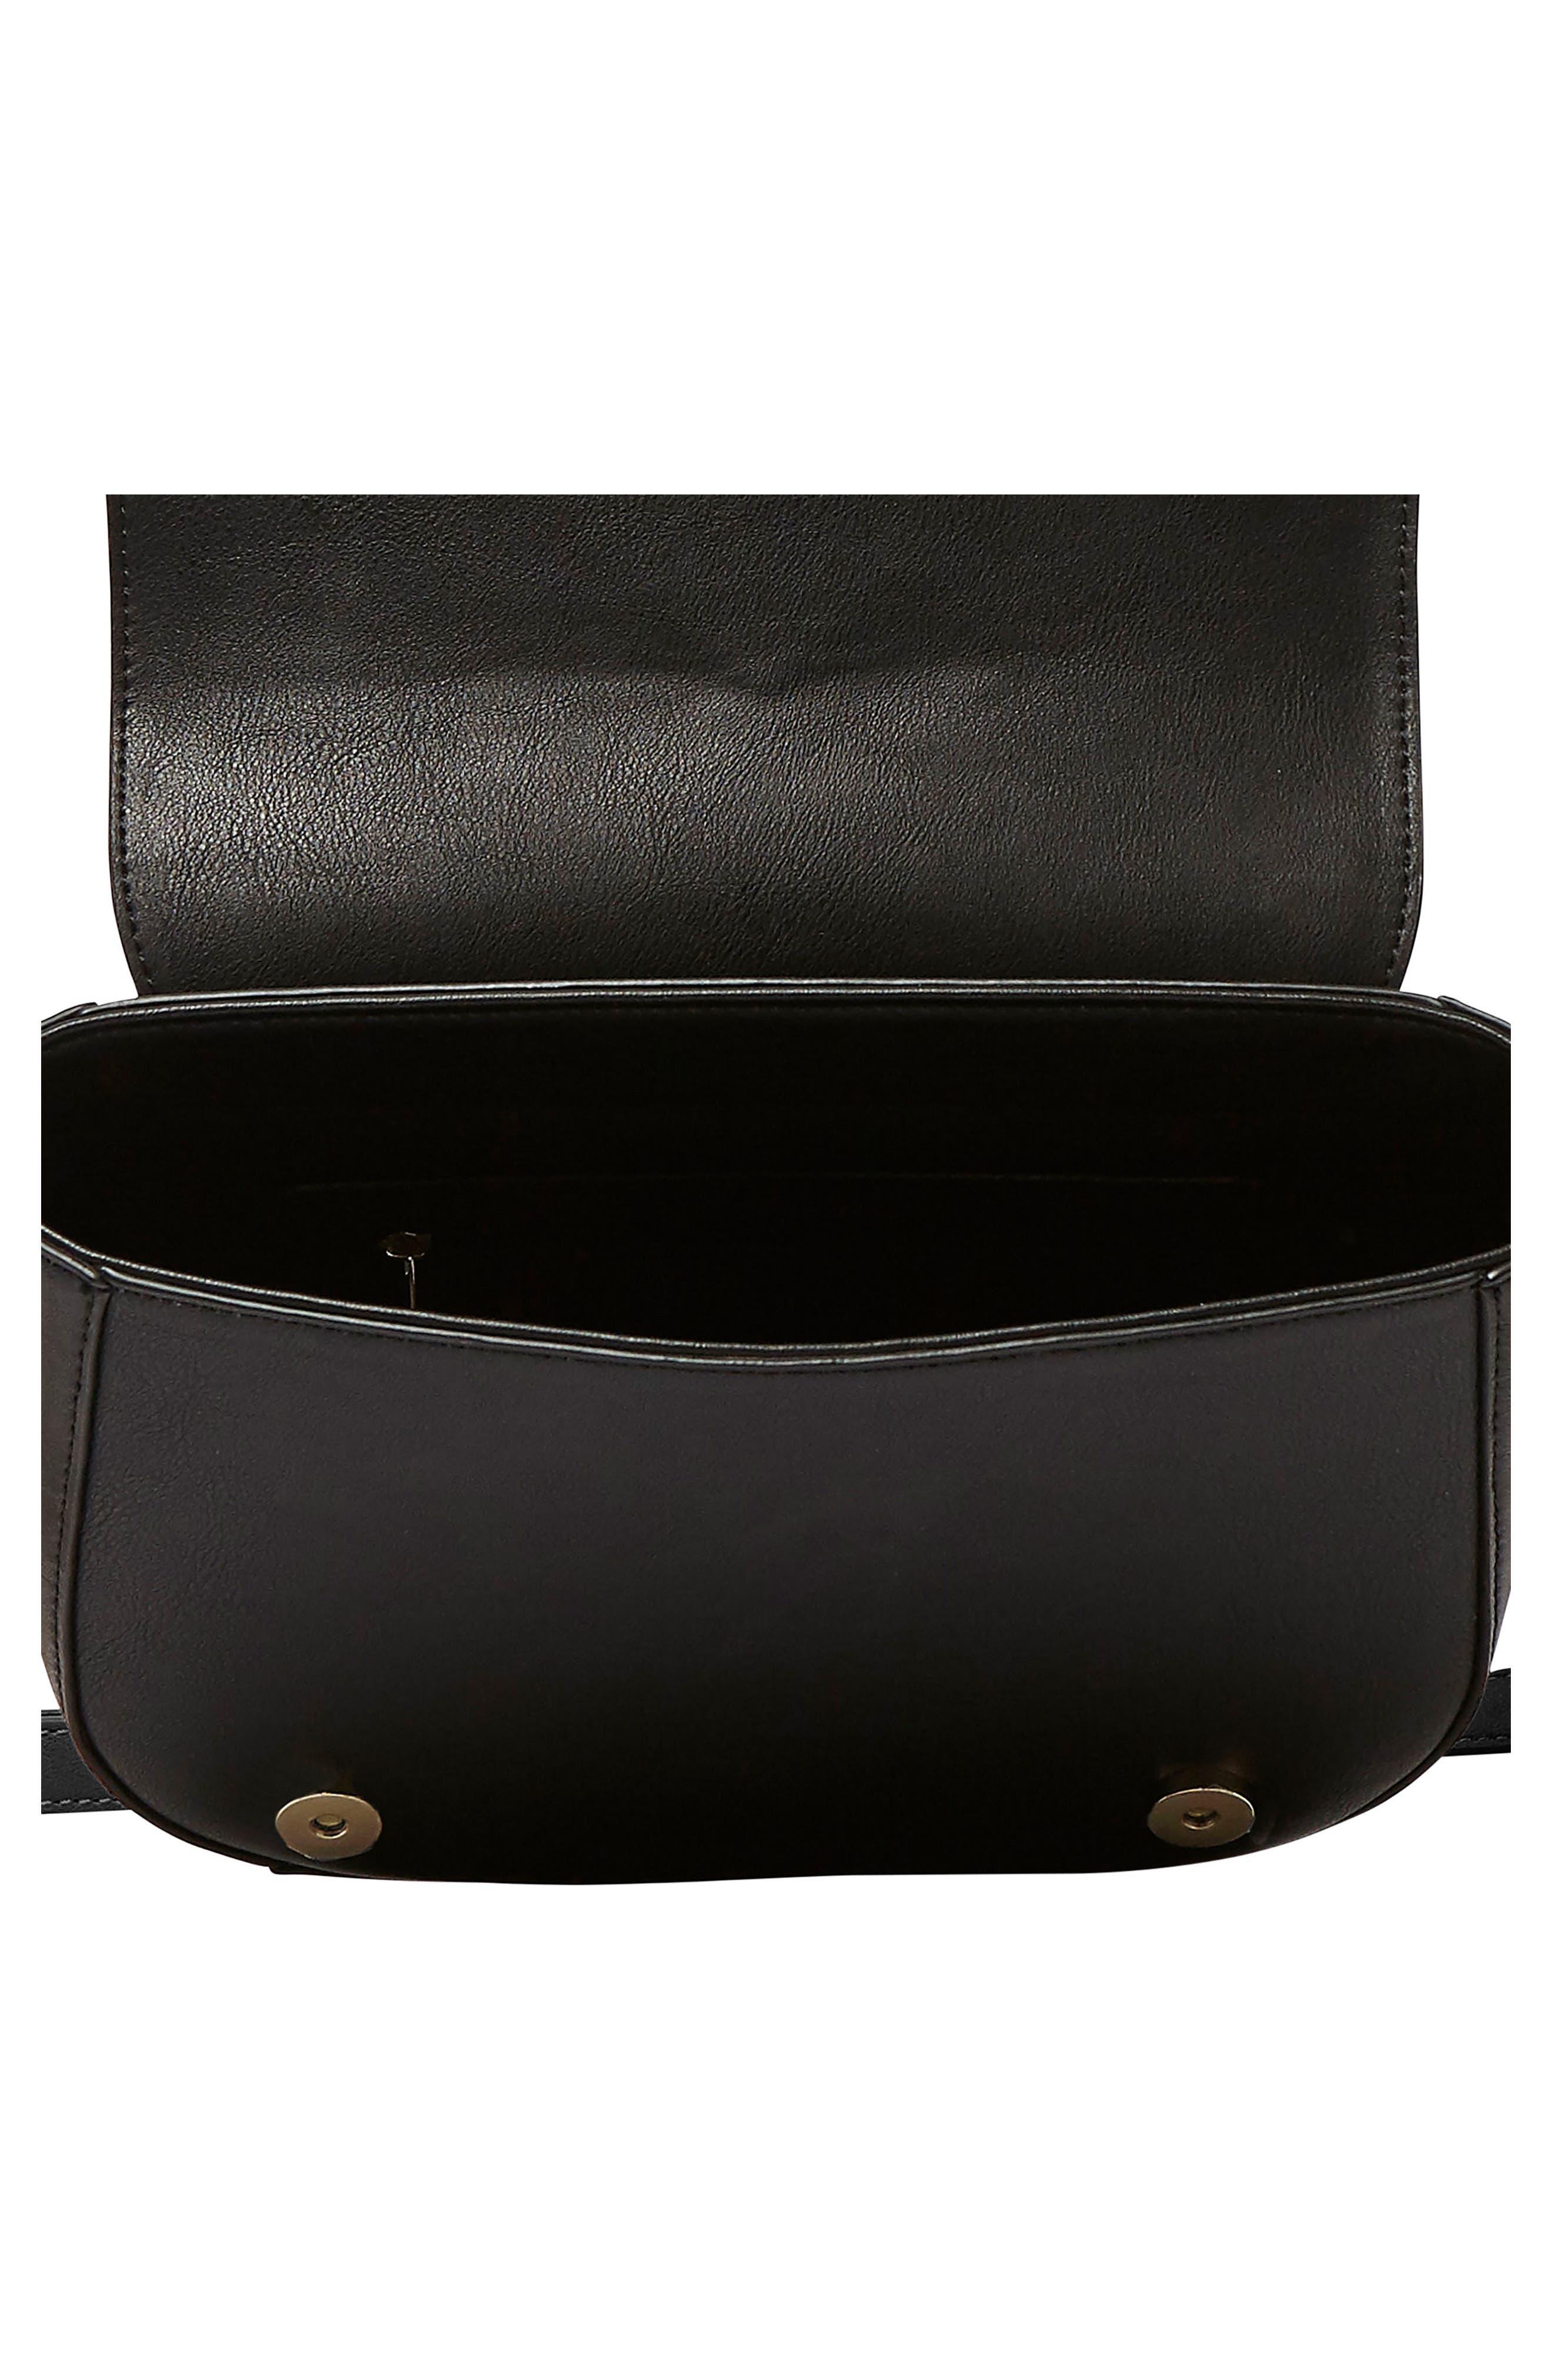 Ventura Vegan Leather Crossbody Bag,                             Alternate thumbnail 3, color,                             Black